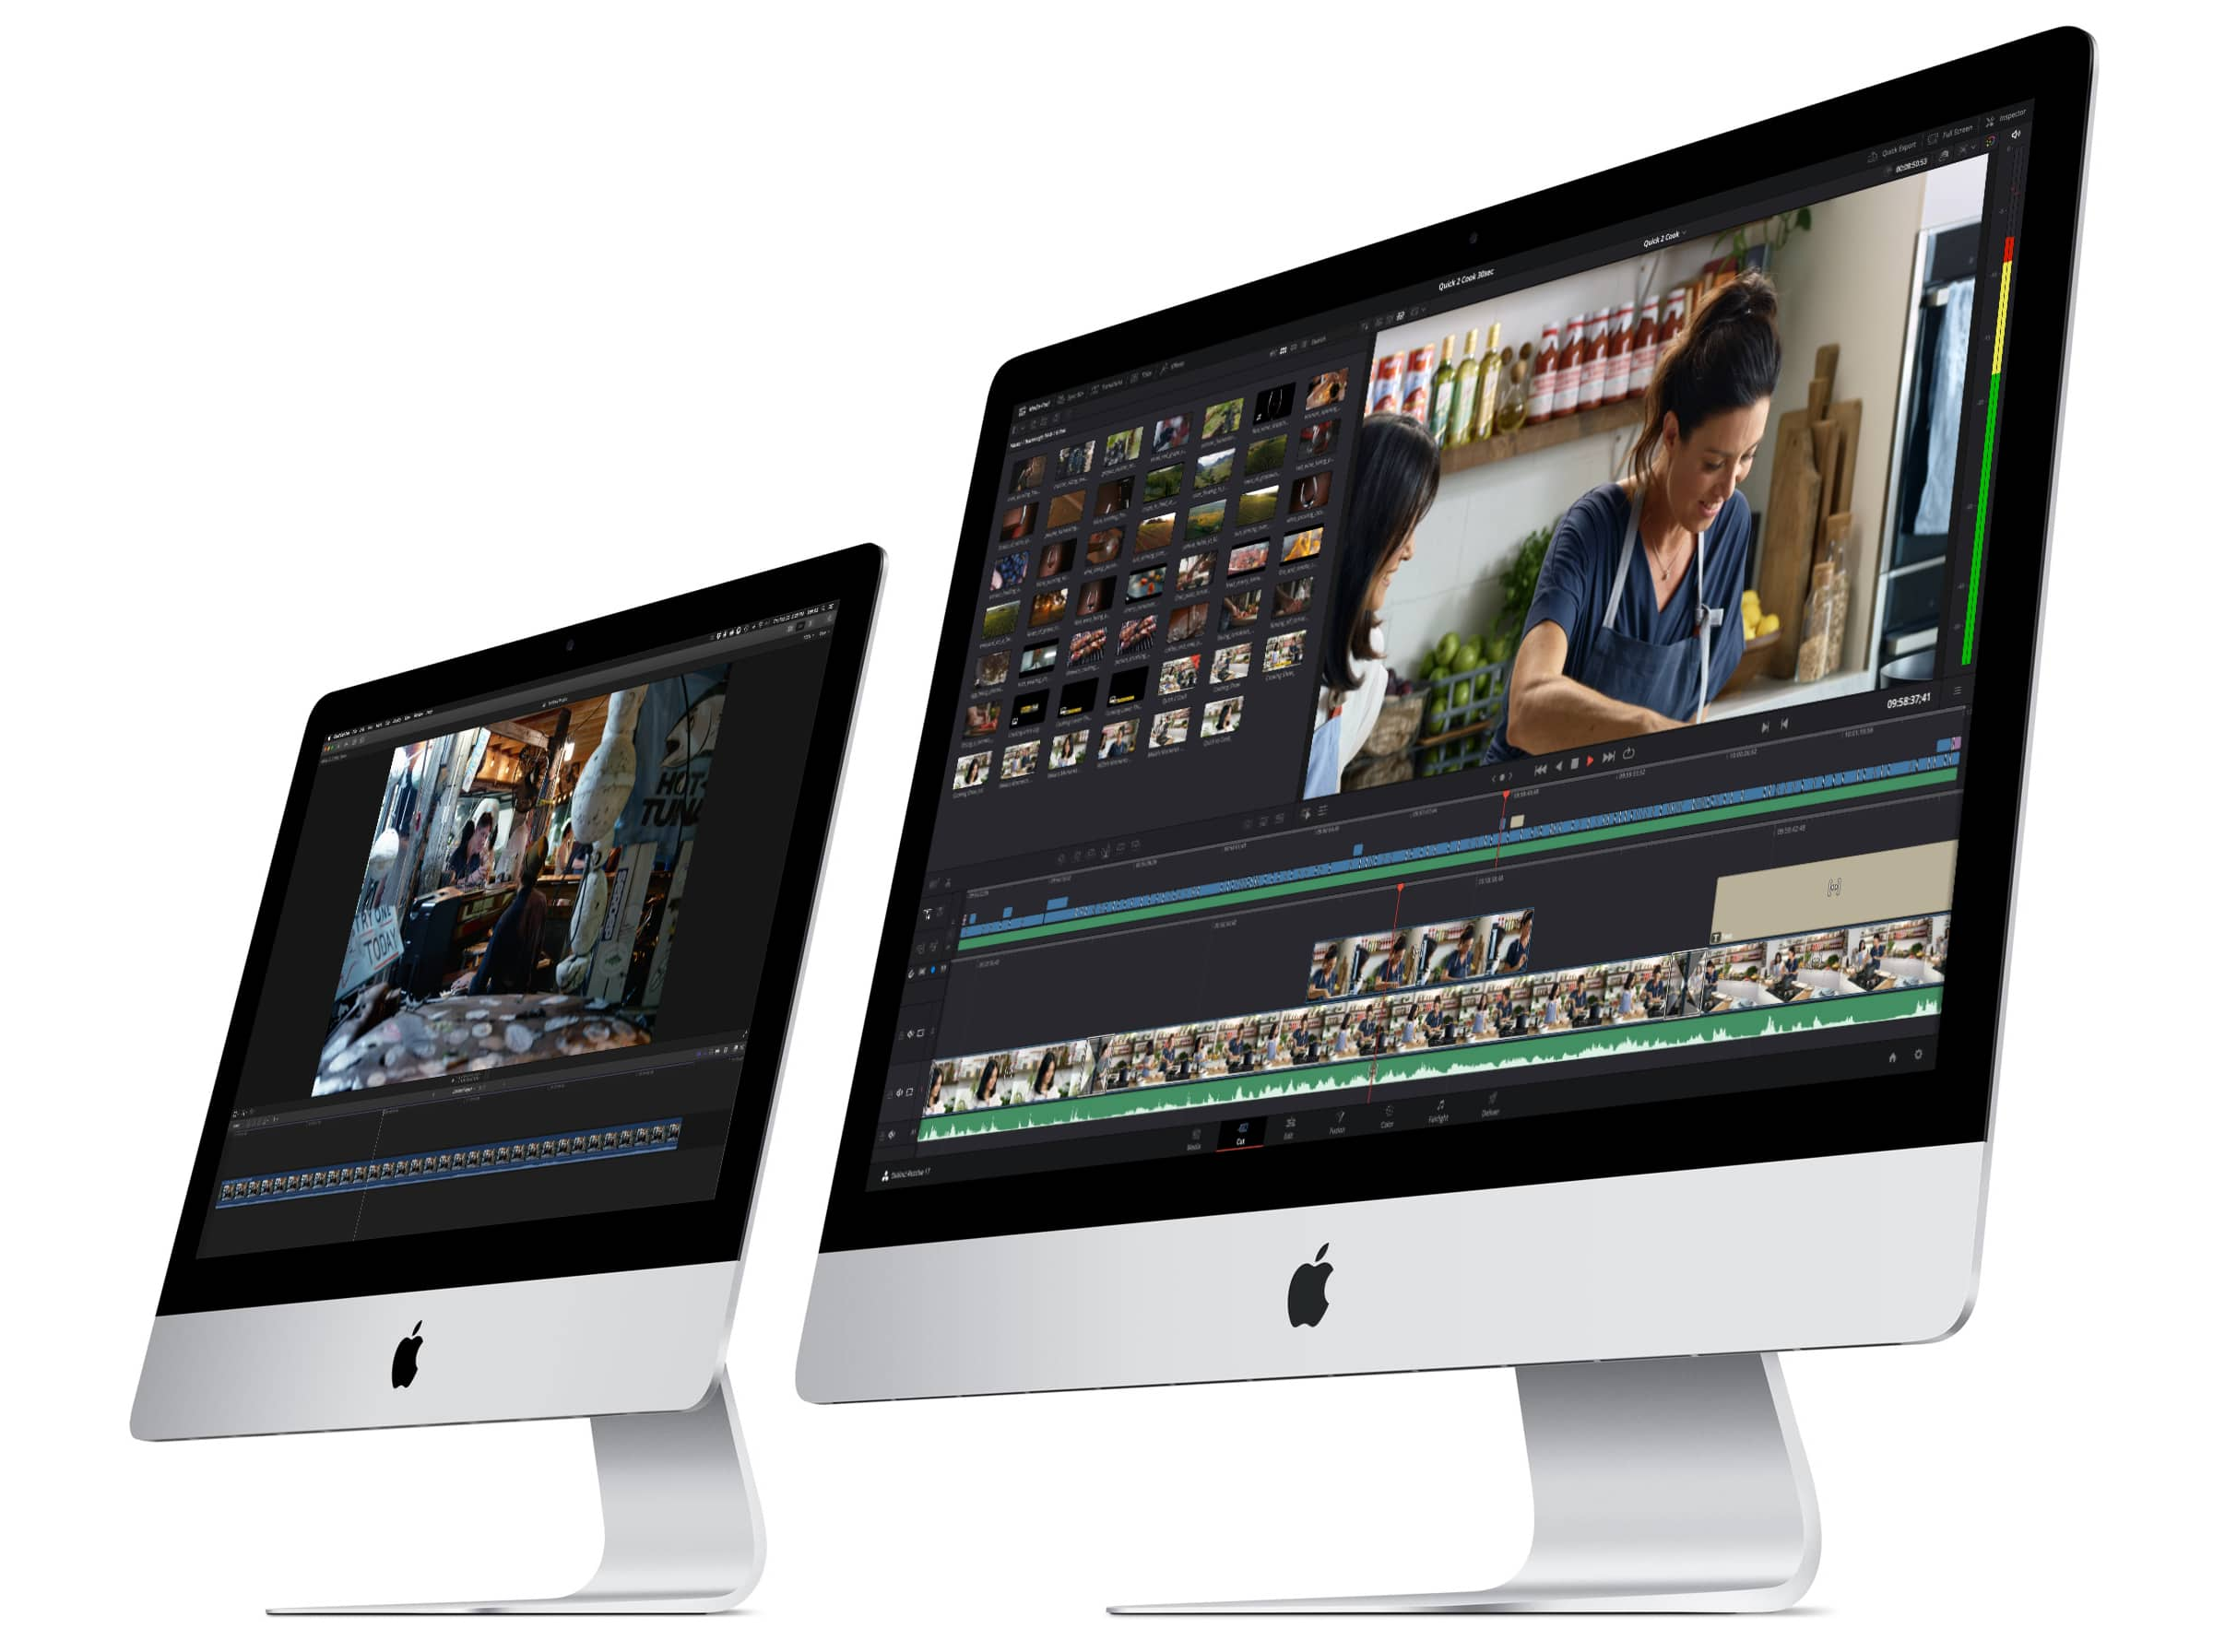 Trusting Apple Displays? 24